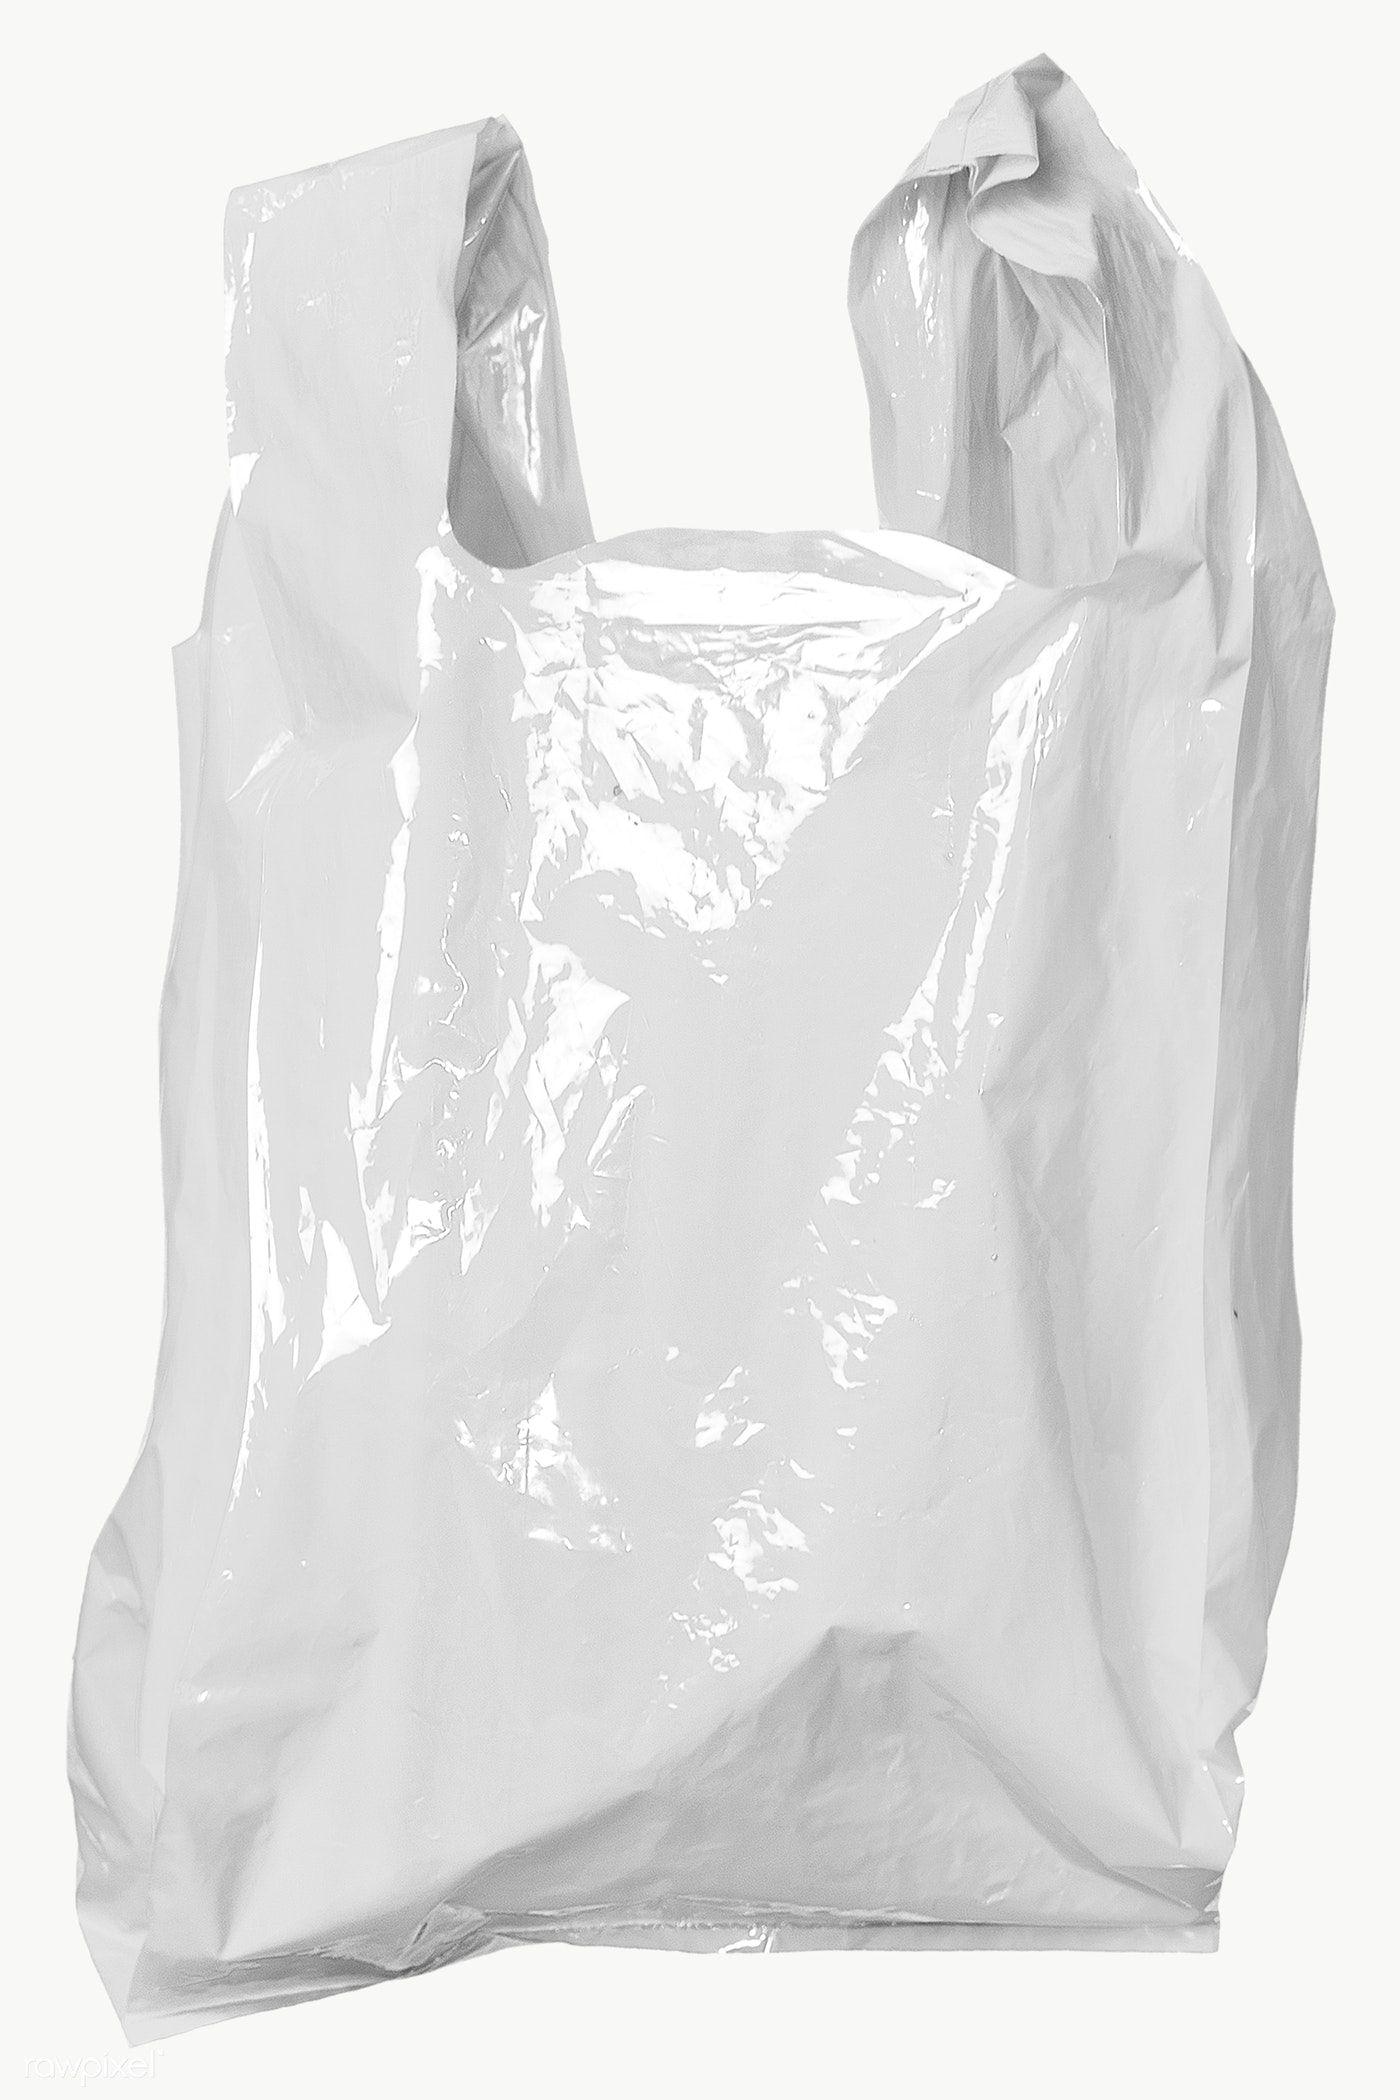 Shiny White Plastic Bag Mockup Transparent Png Free Image By Rawpixel Com Sasi Plastic Texture Bag Mockup Texture Graphic Design